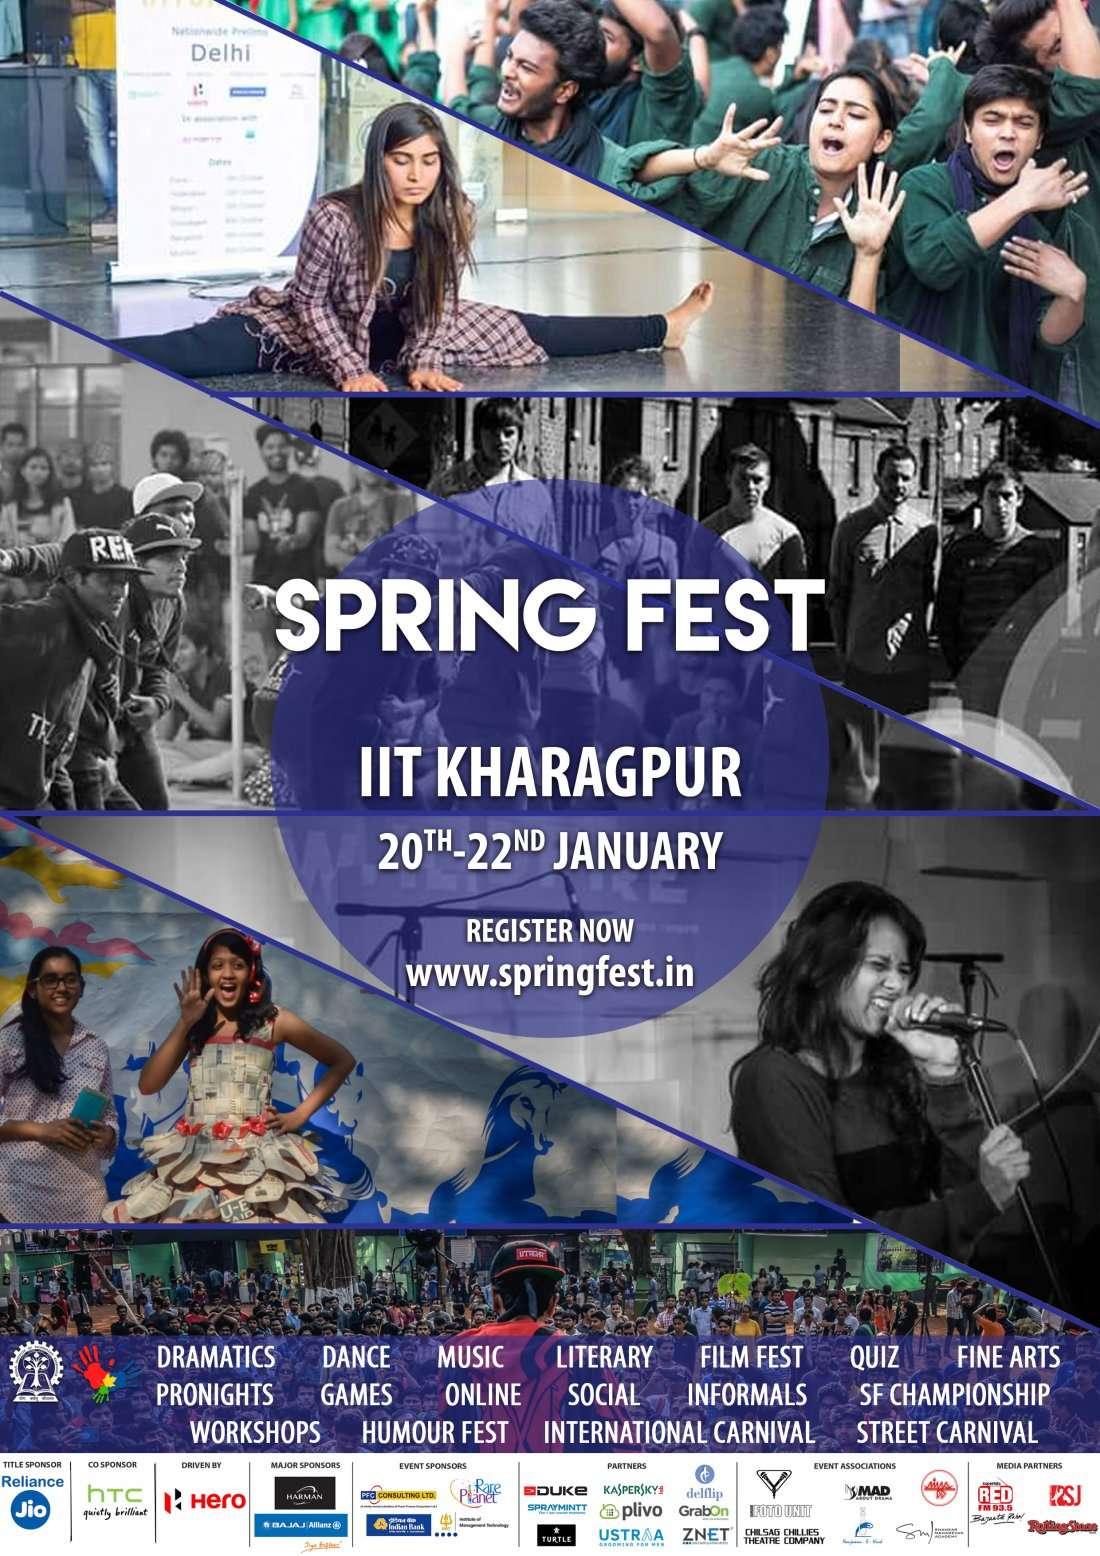 SPRING FEST 2017 IIT KHARAGPUR